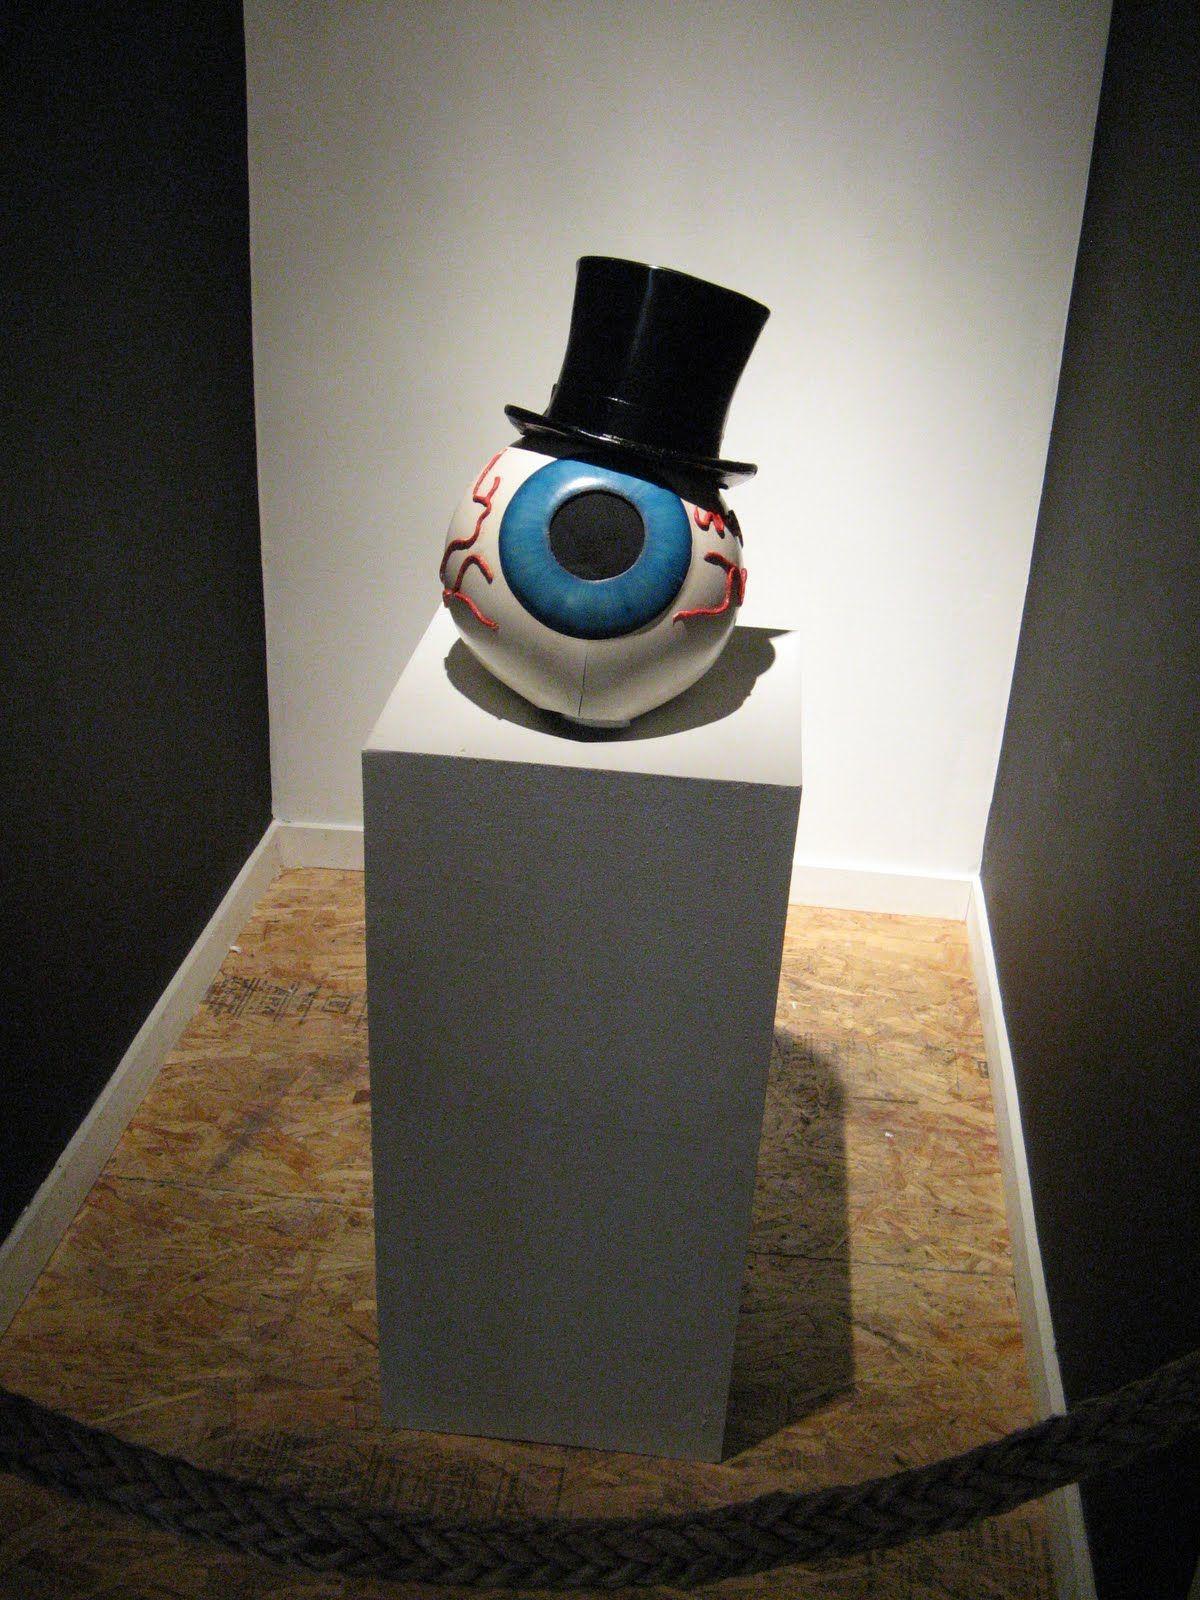 Original eyeball mask from The Residents music video ...